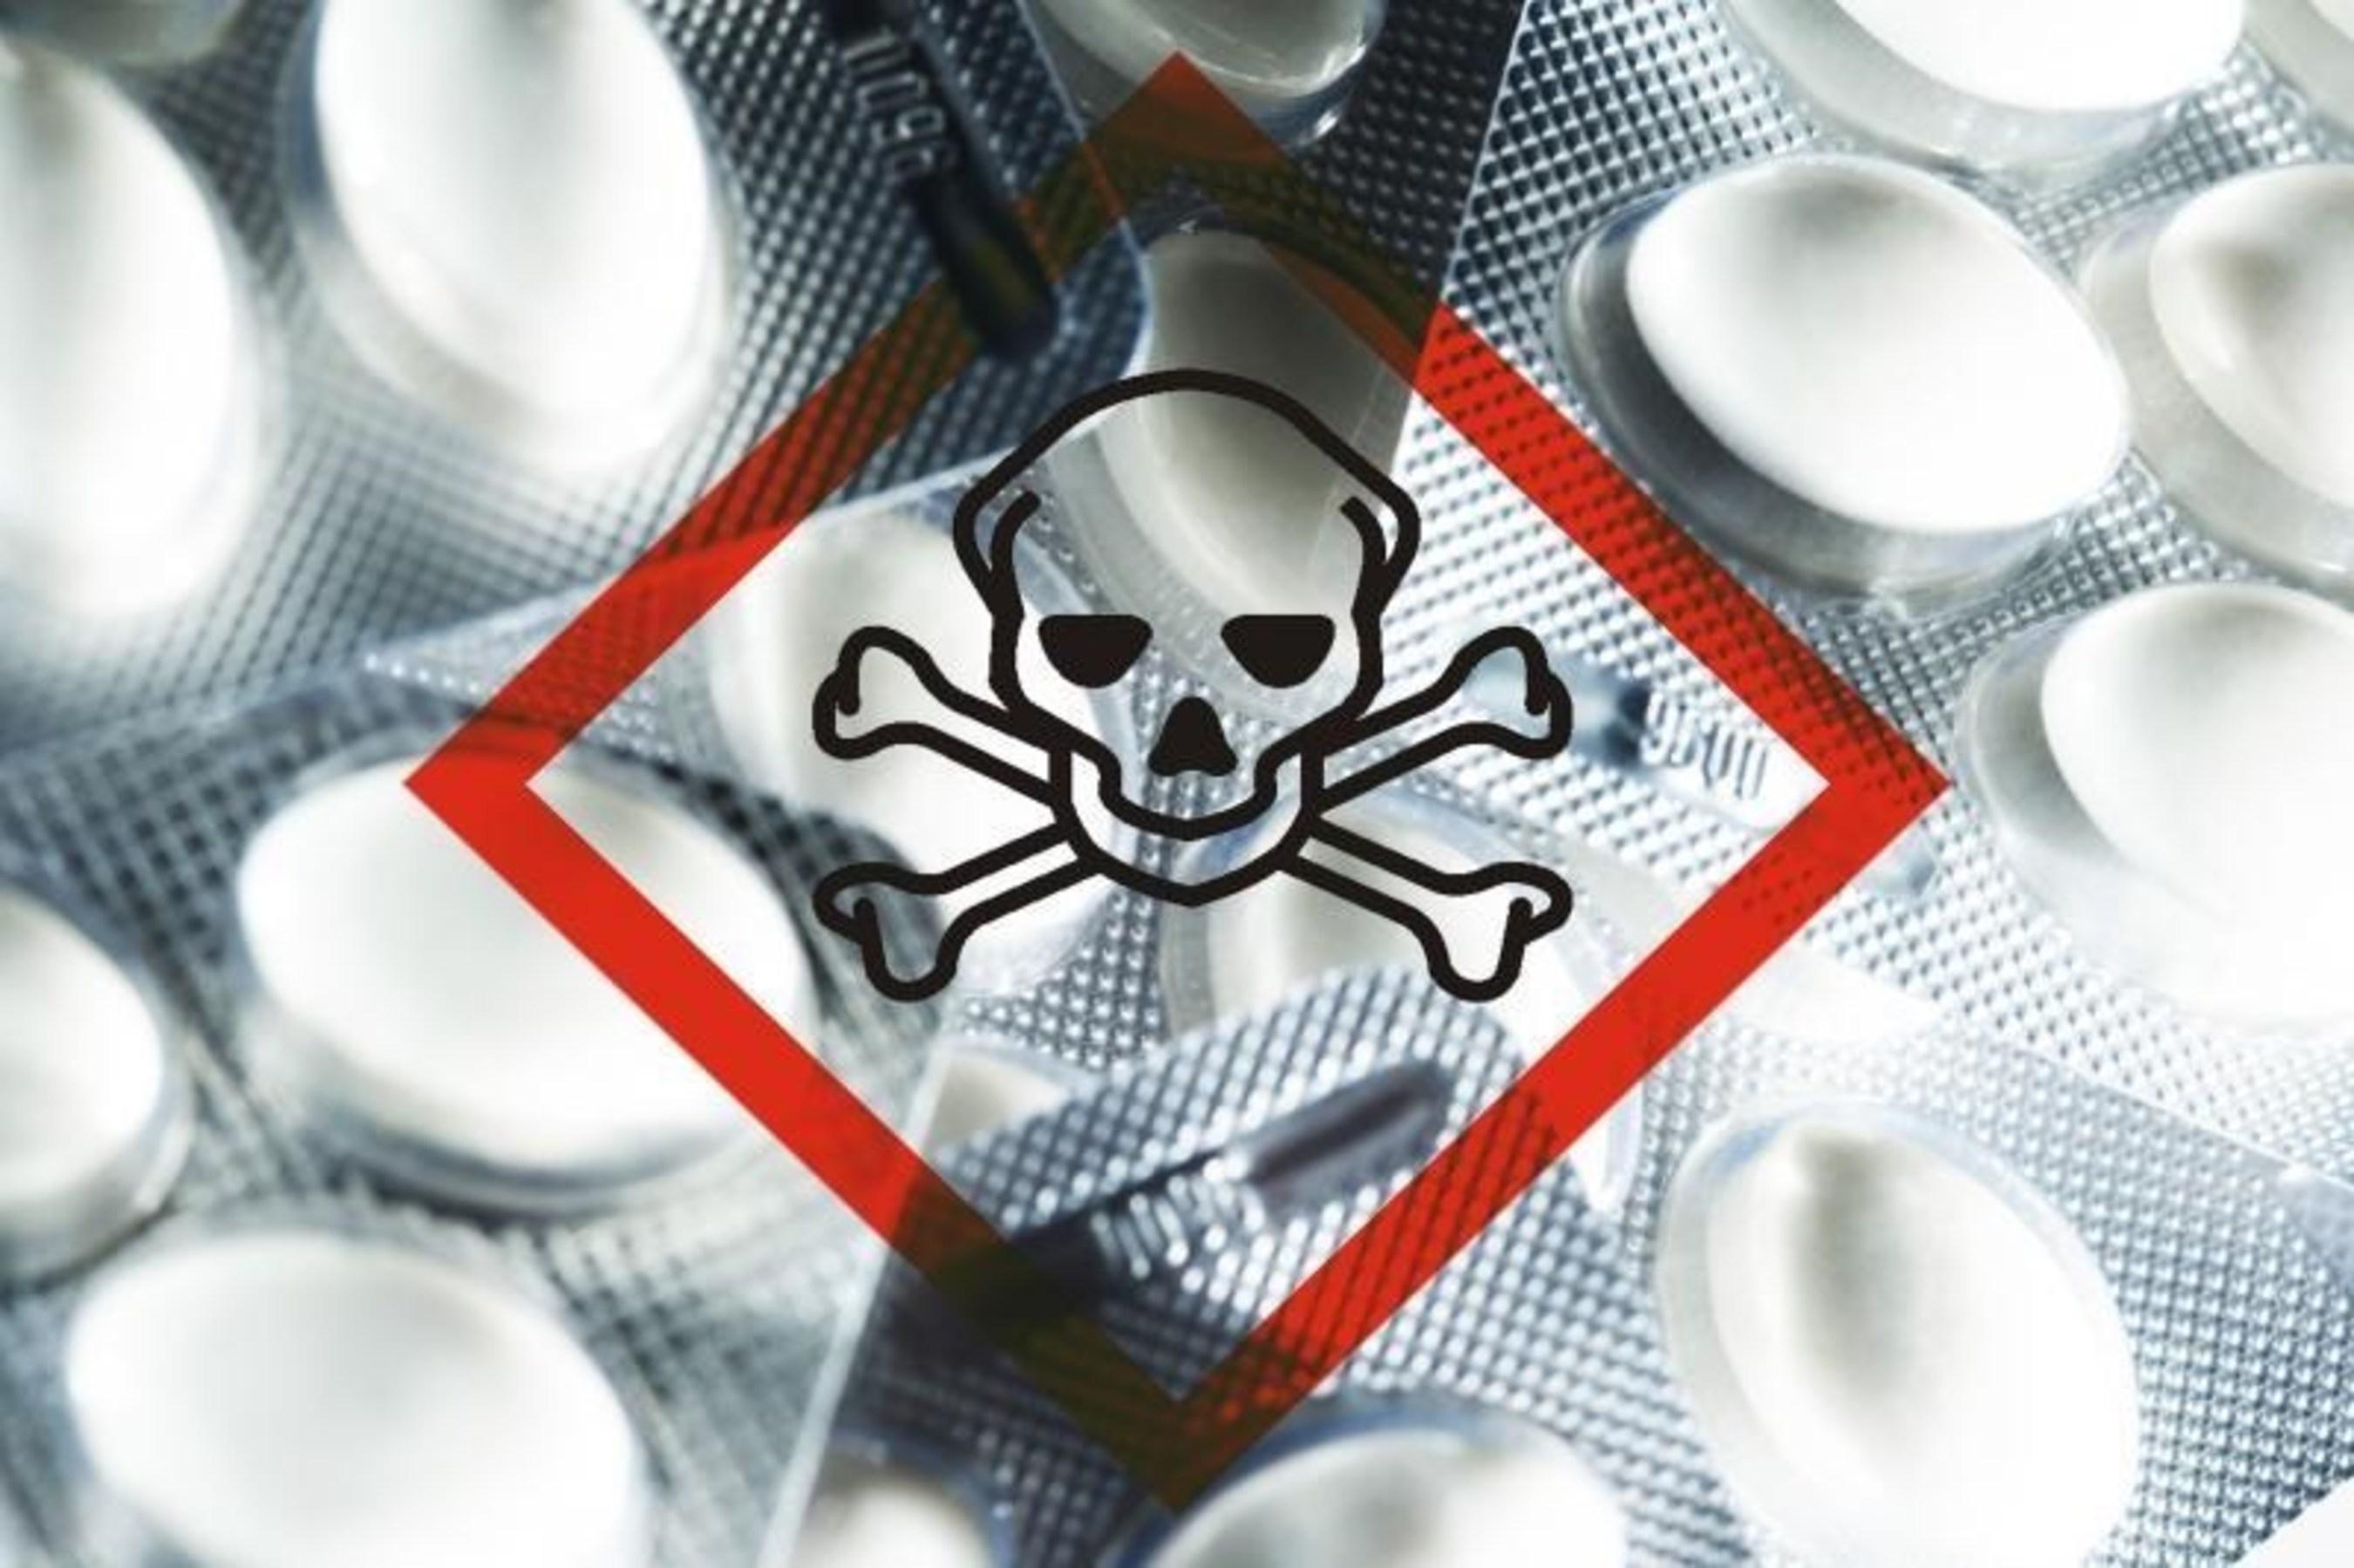 Counterfeits danger